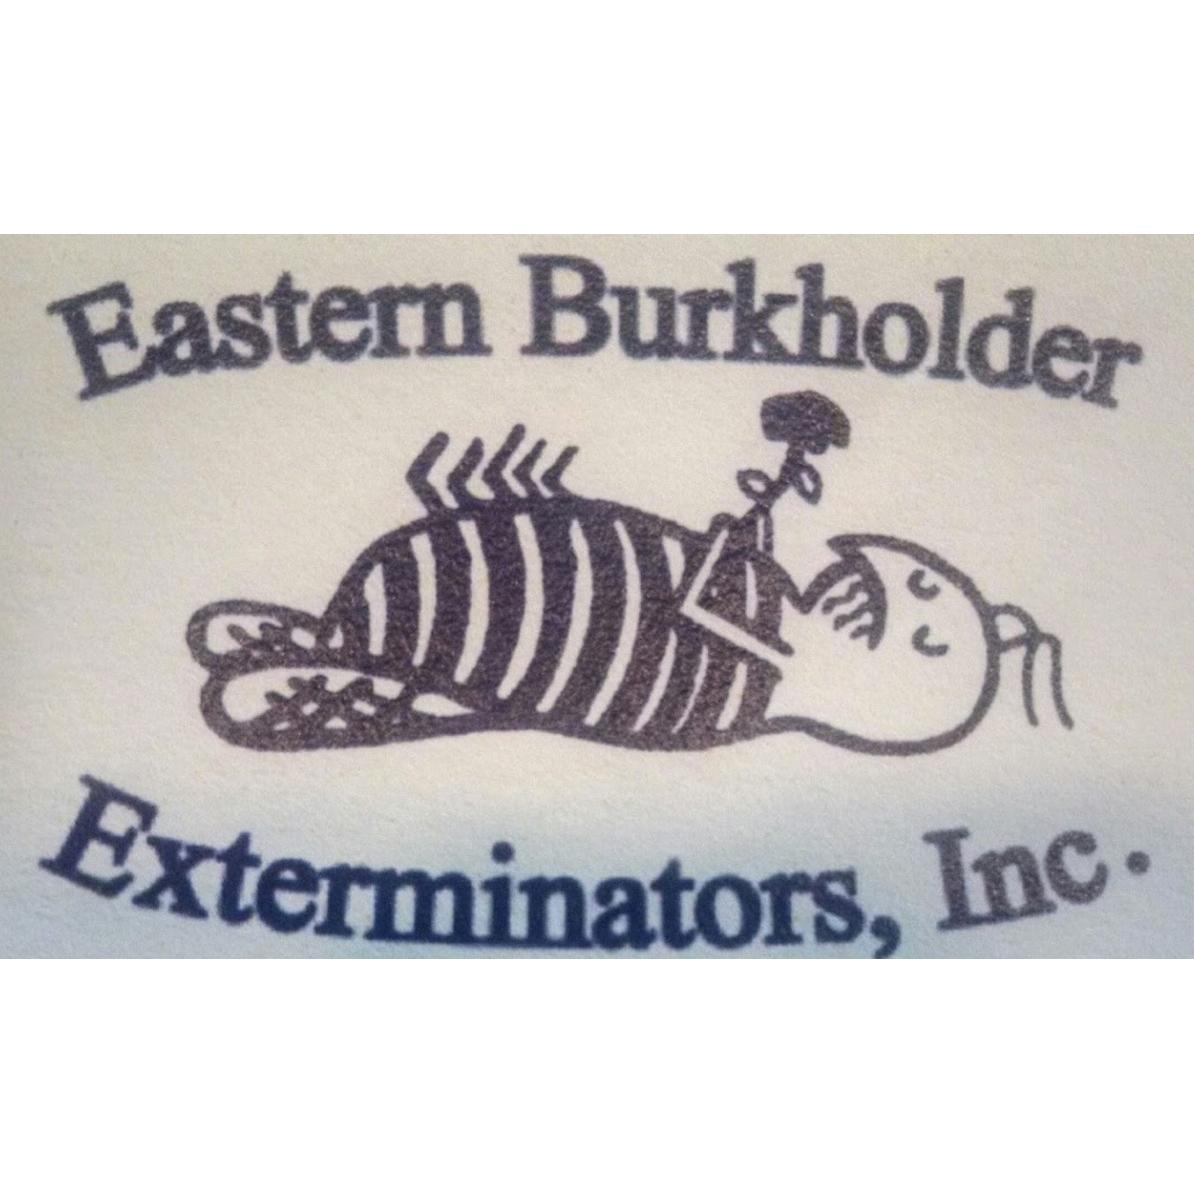 Eastern-Burkholder Exterminators Inc